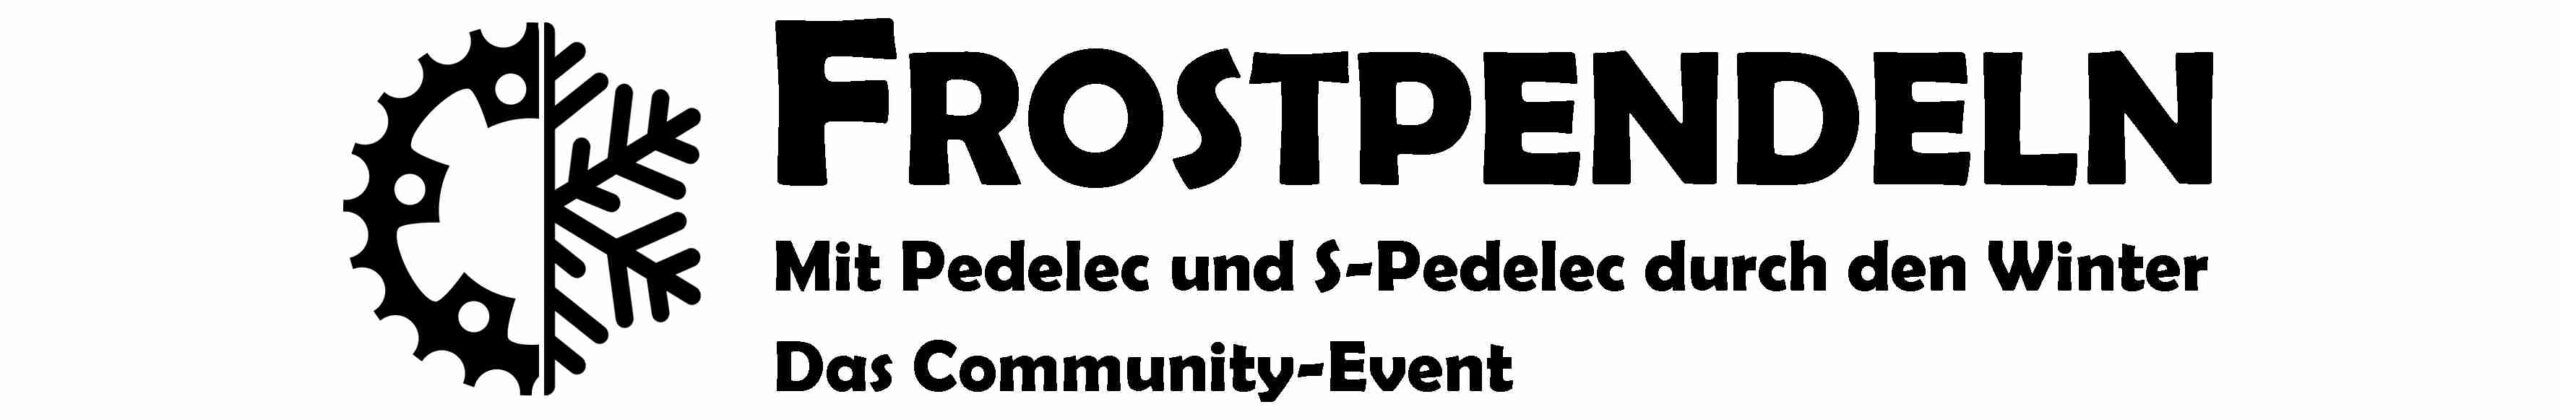 Frostpendeln 2021 Logo